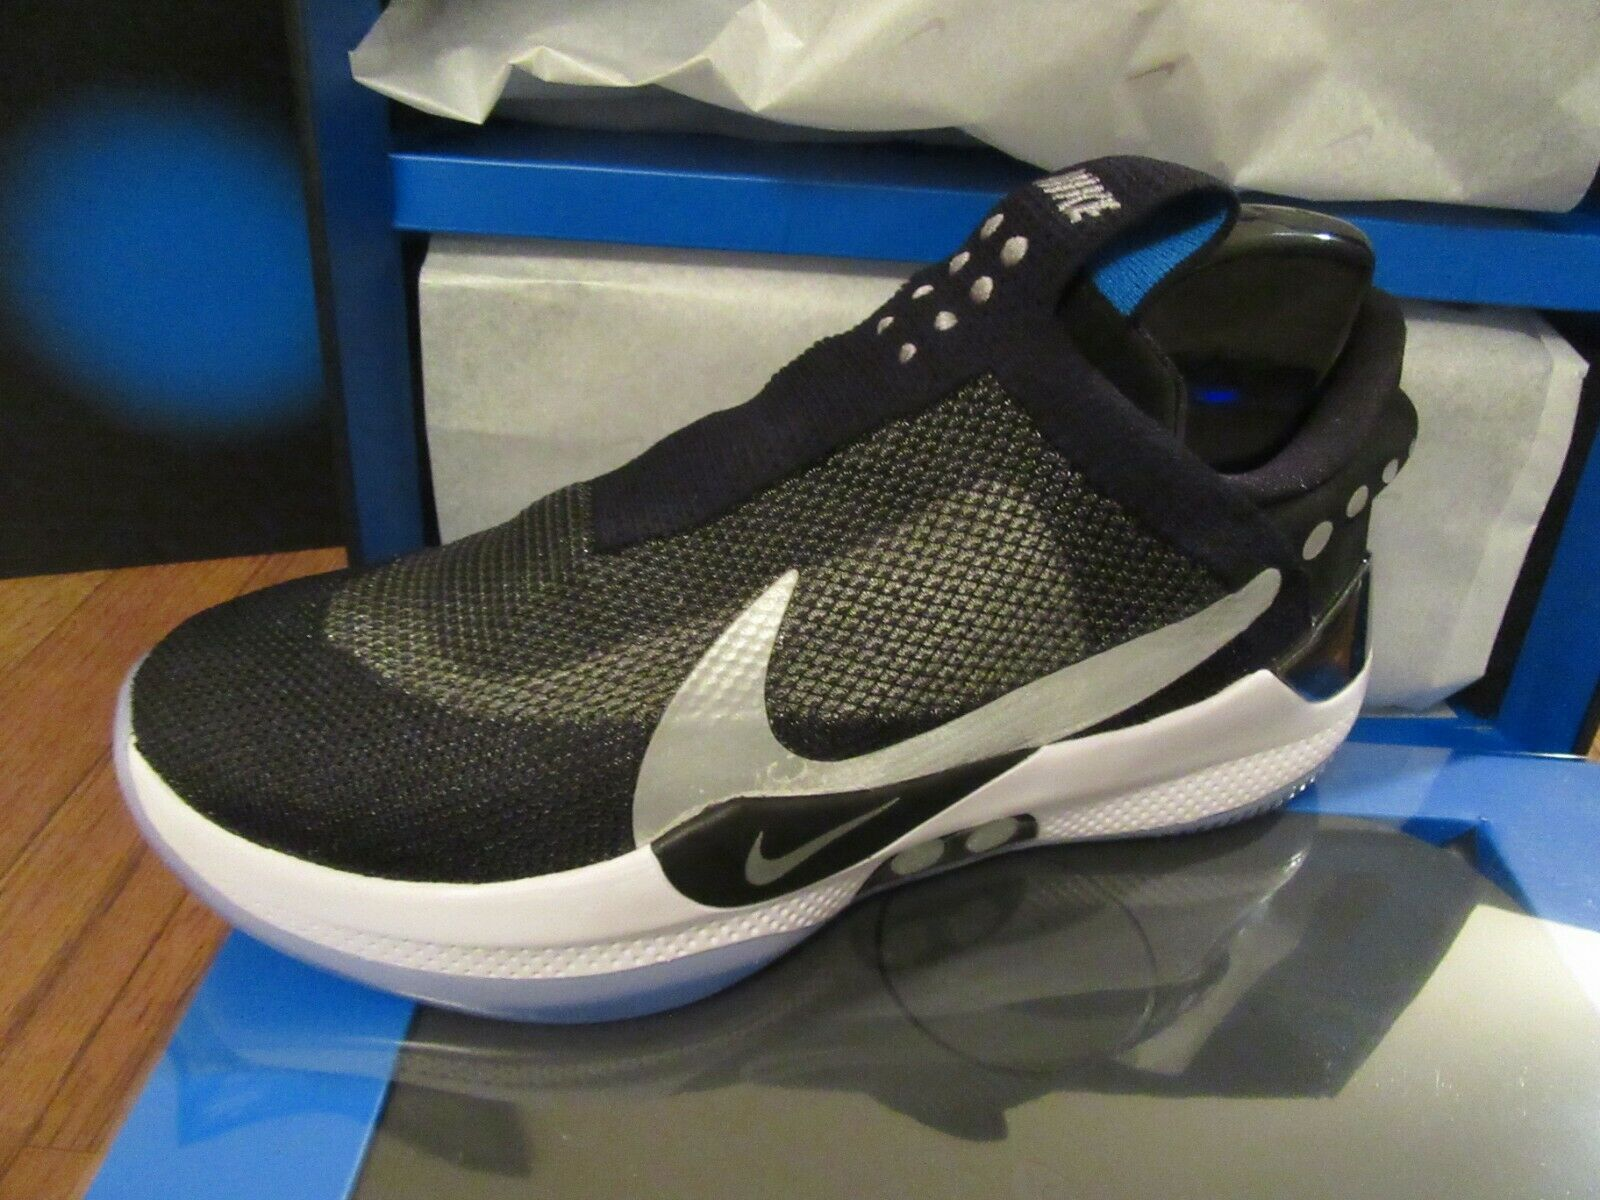 Nike Adapt BB Size 11.5 Black Reflect Silver AO2582 001 Brand New DS NIB 2019